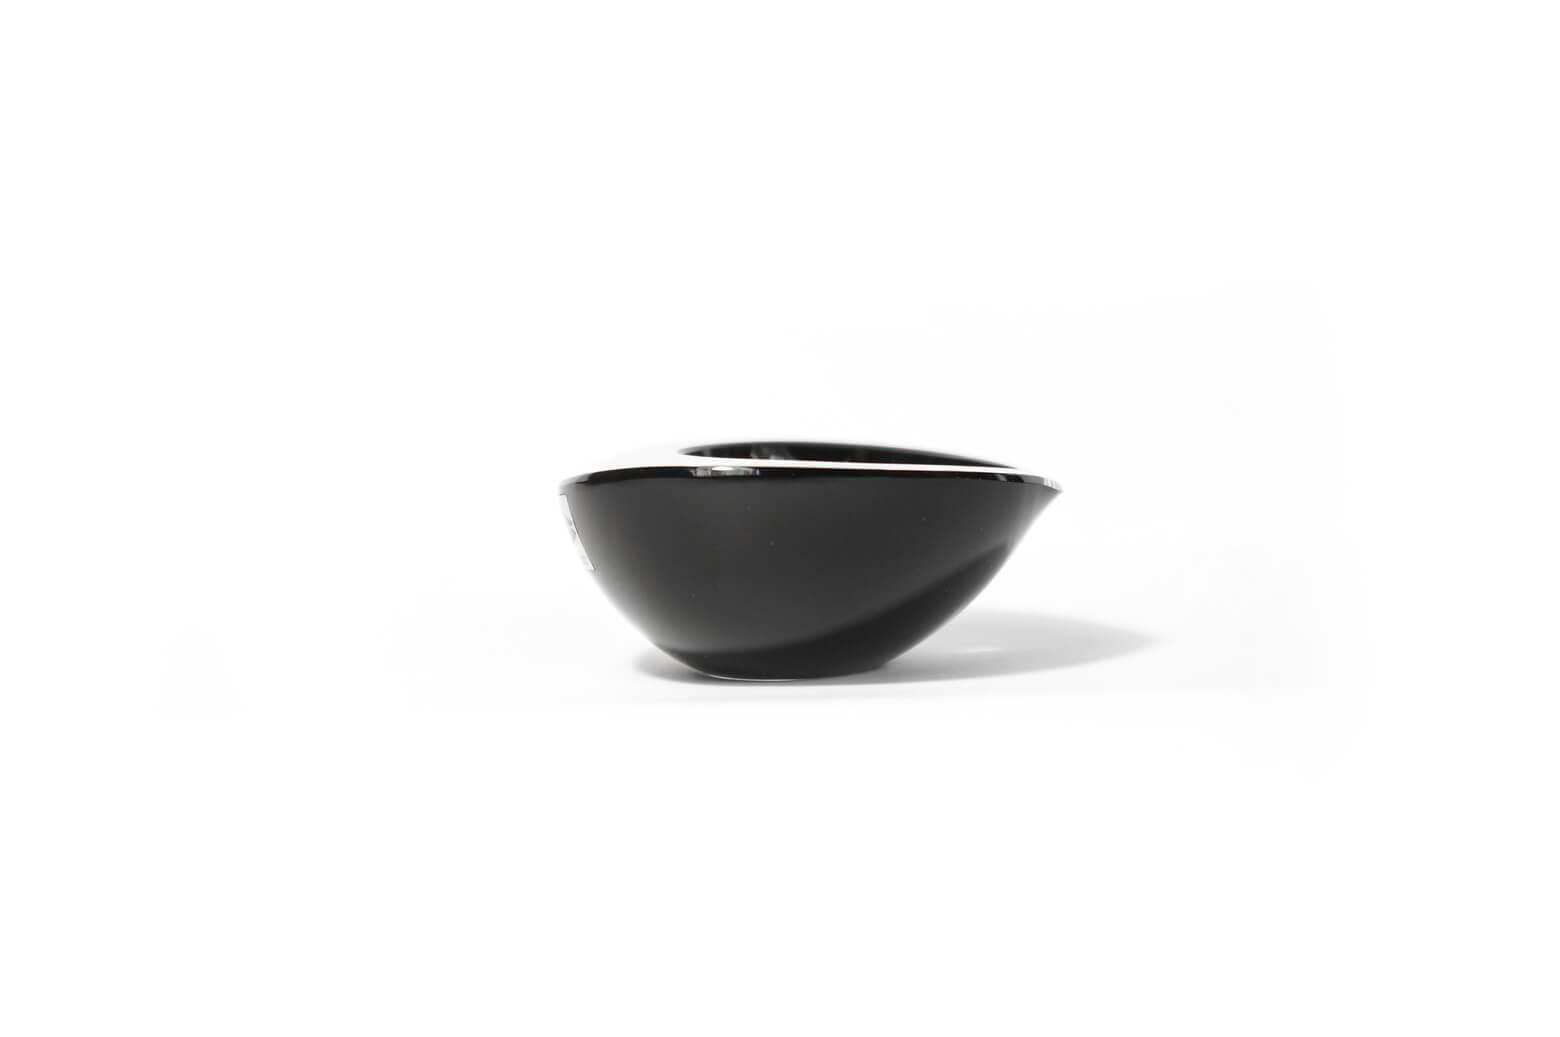 "Nuutajärvi Kaj Franck ""Kastanja"" Bowl/ヌータヤルヴィ カイ・フランク ボウル ガラス 北欧 雑貨 ヴィンテージ"